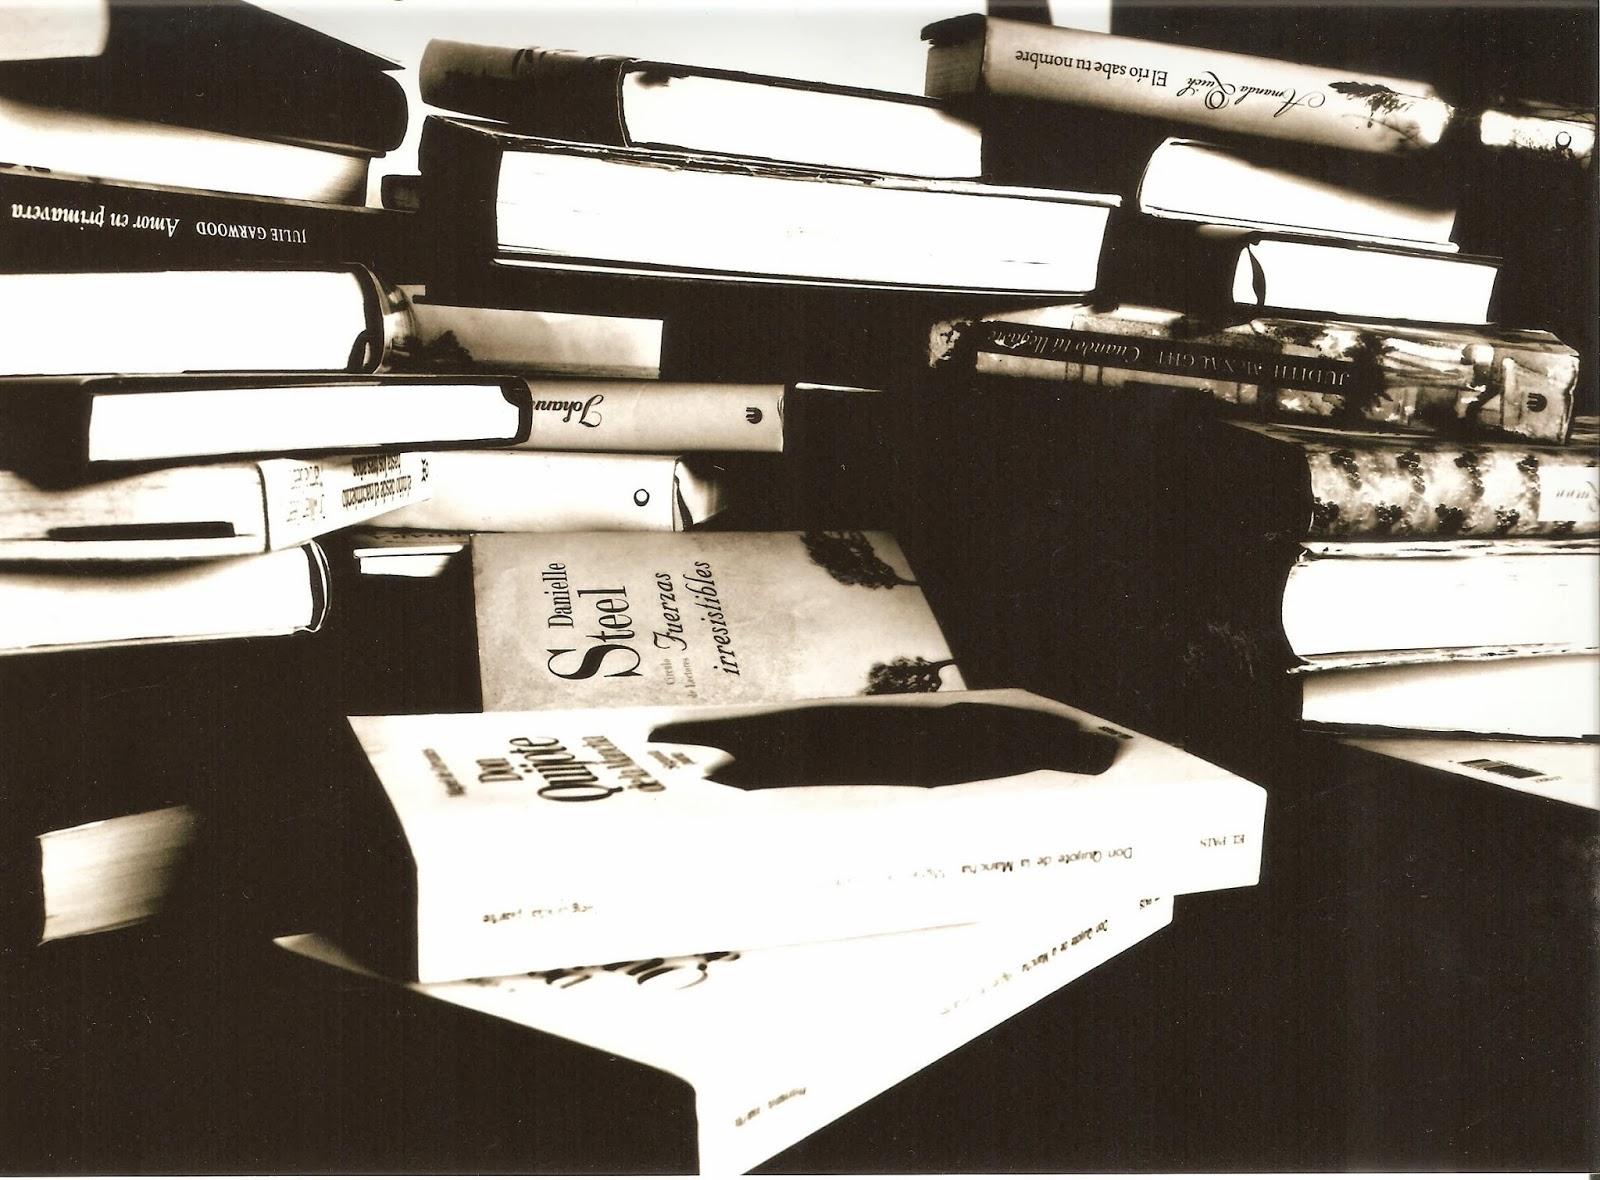 Biblioteca Ies Fuengirola Nº 1 Silencio Se Lee